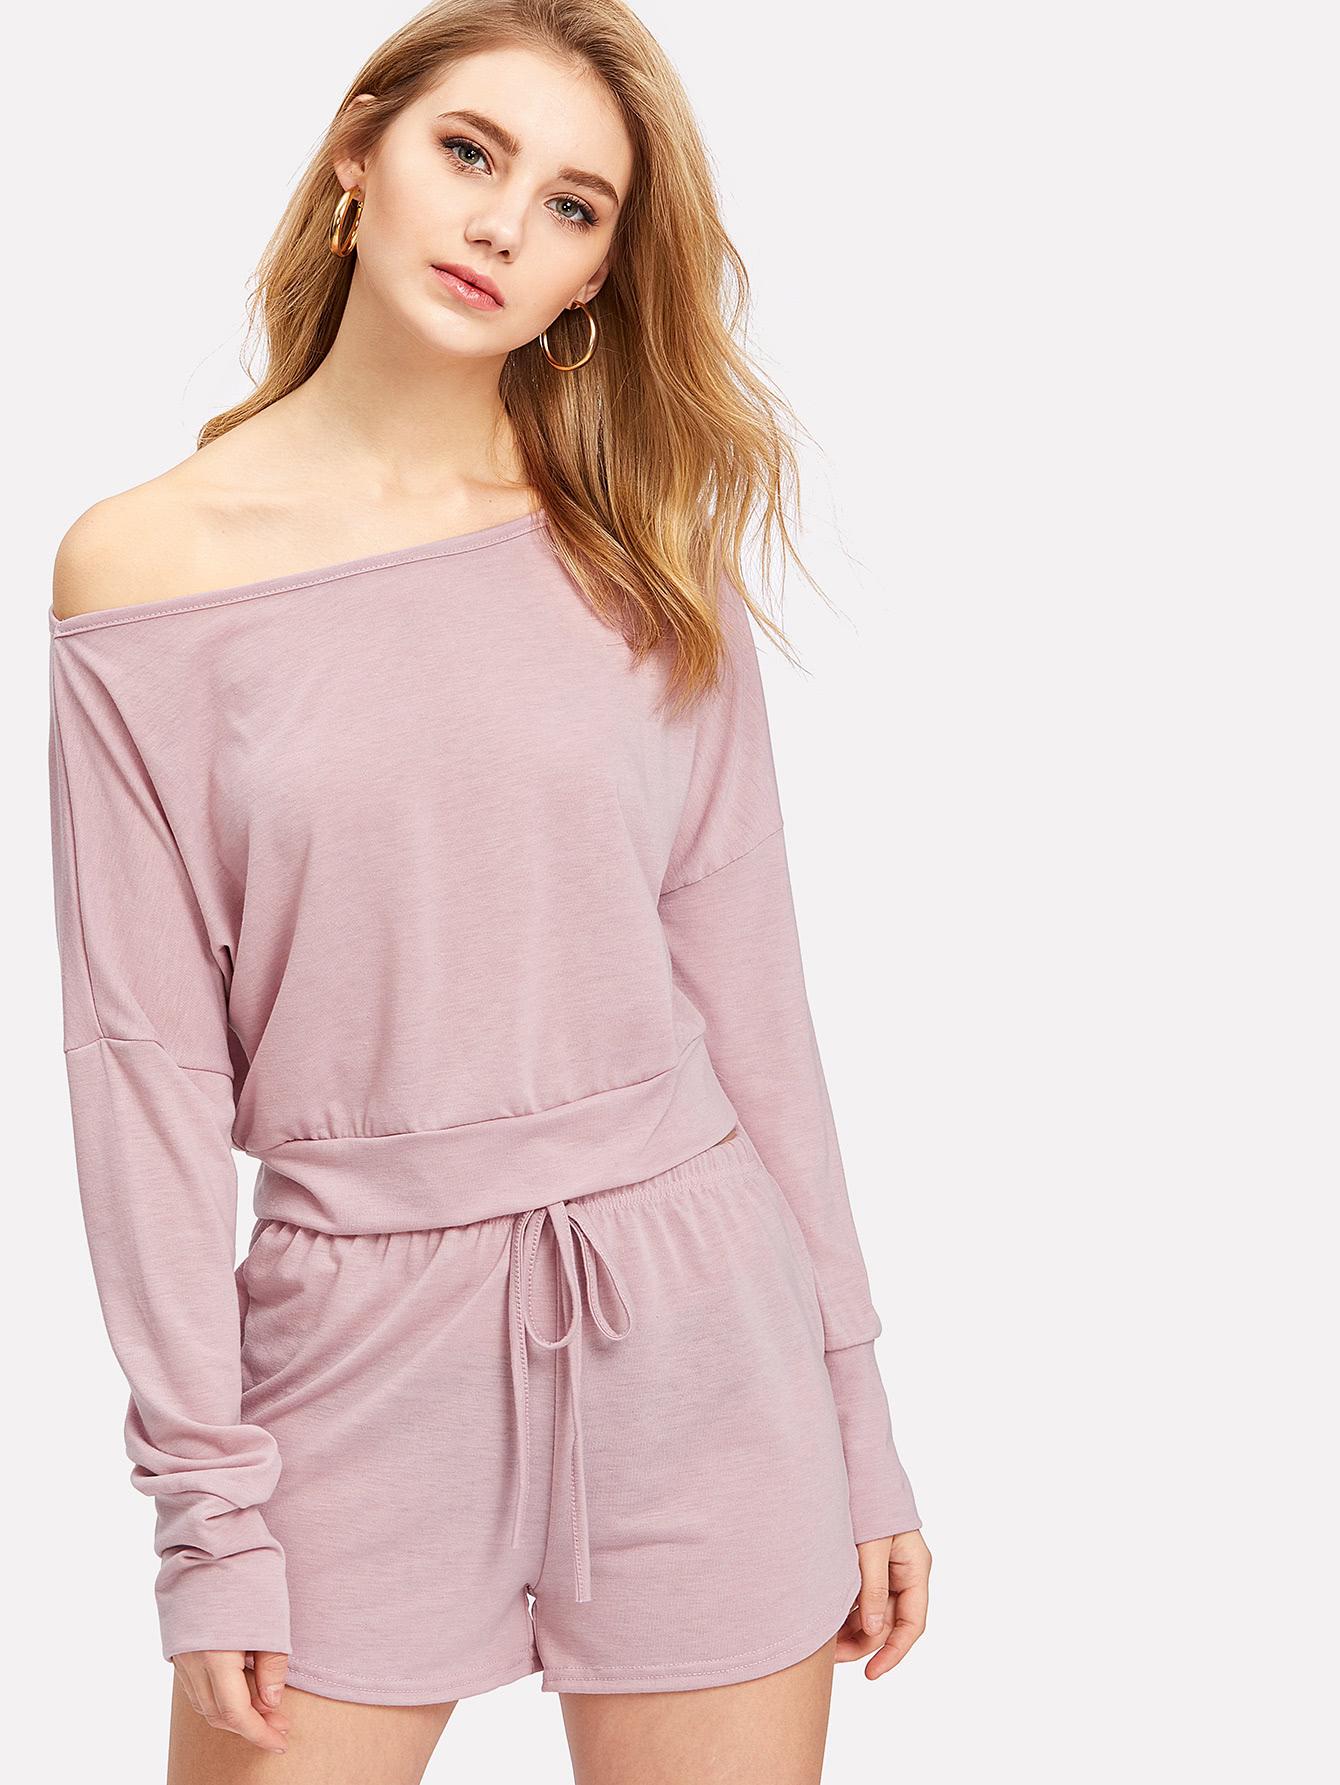 Drop Shoulder Crop Pullover With Shorts